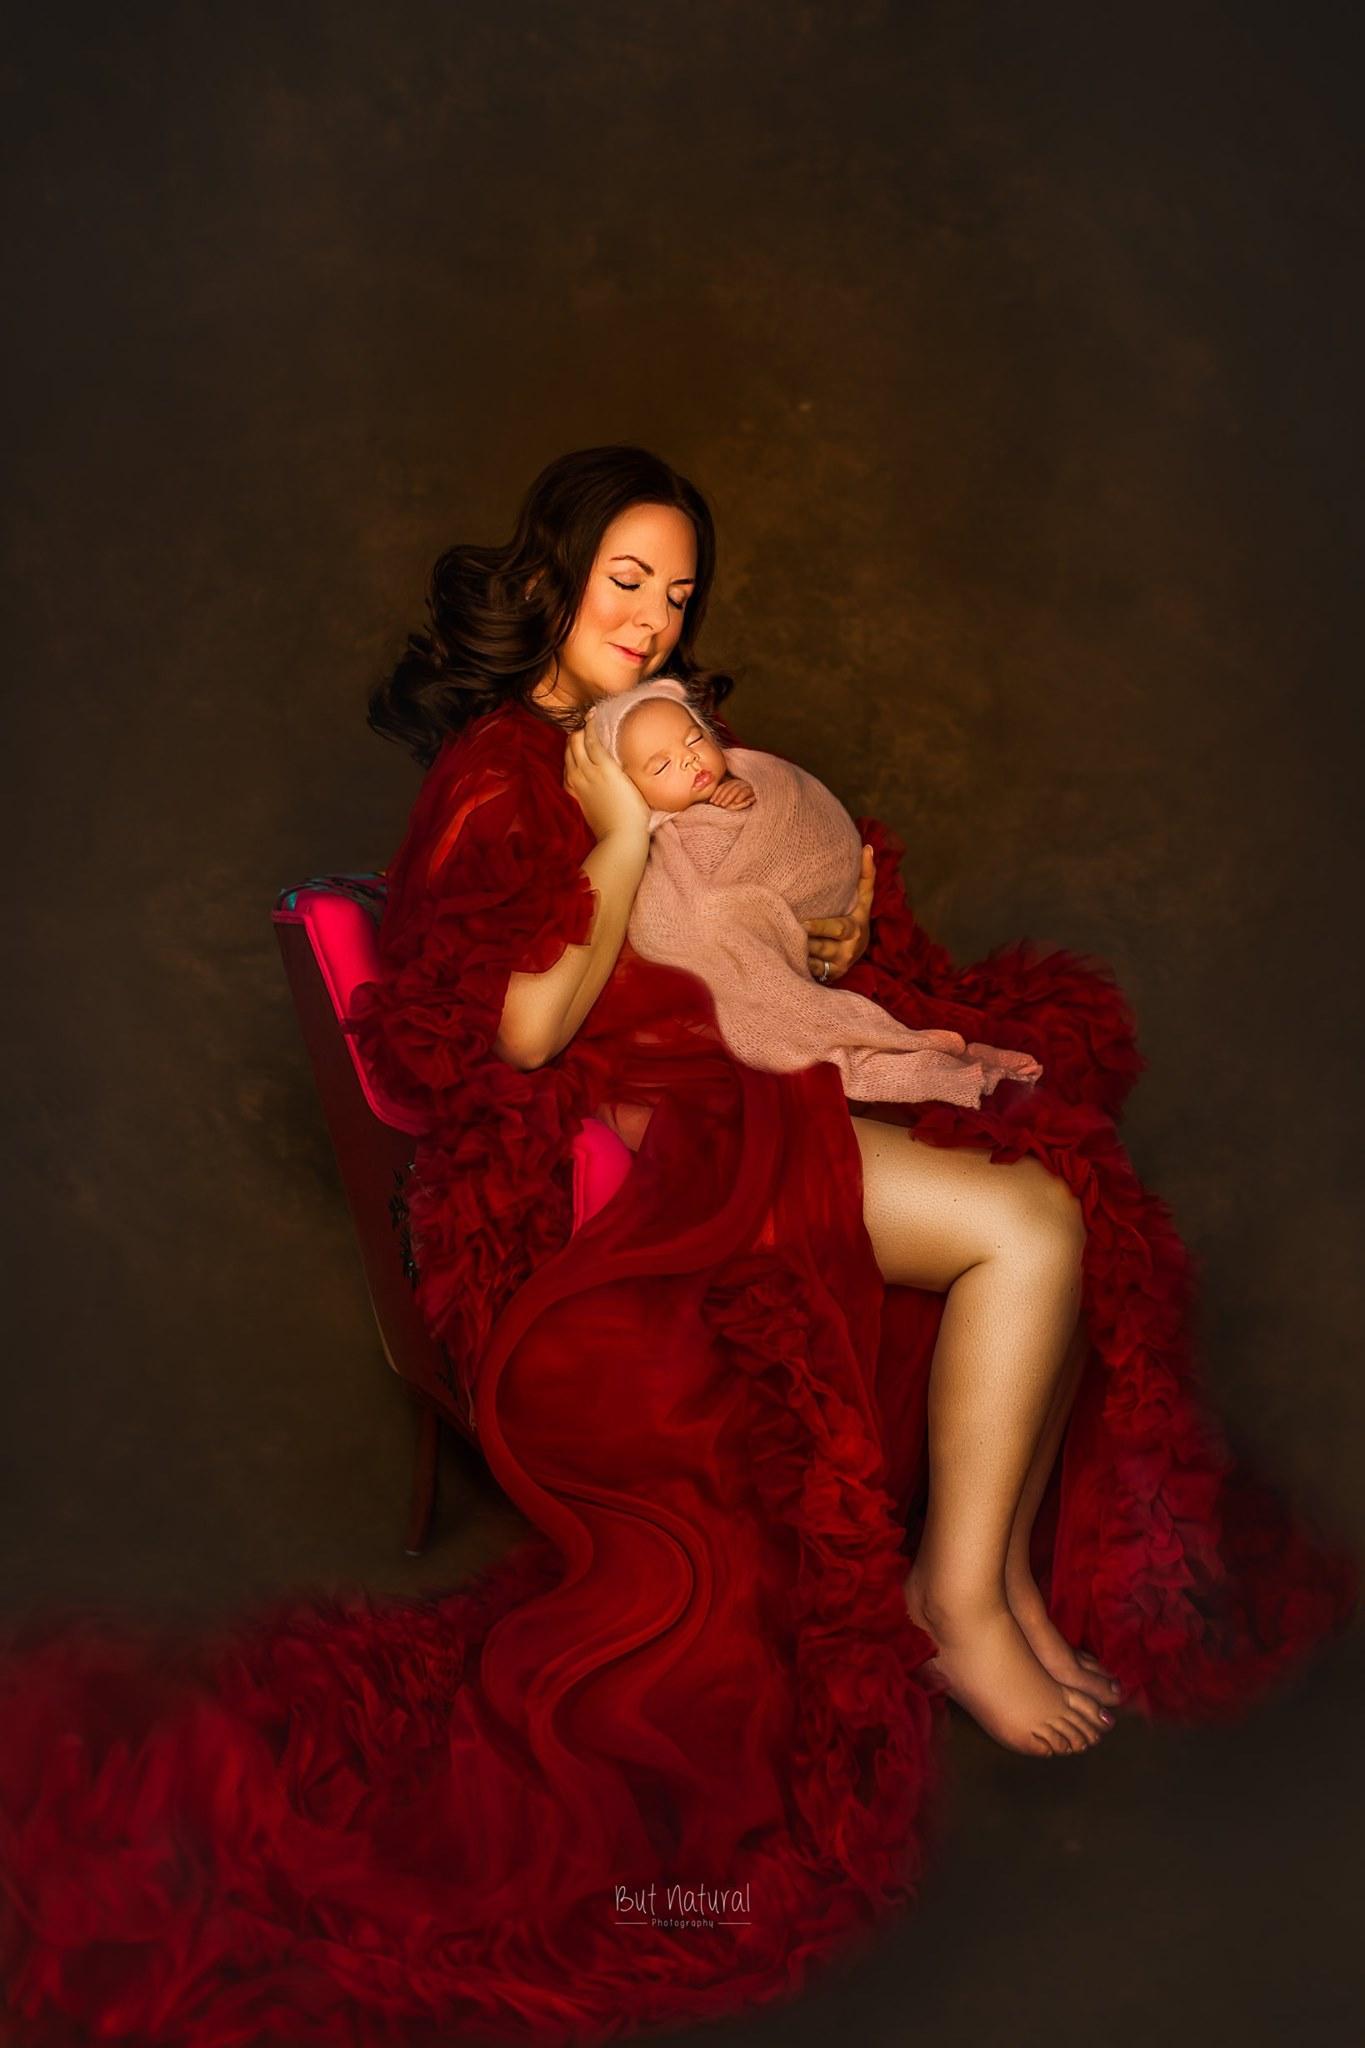 Mom with her newborn baby | Sujata Setia - Newborn photographer | But Natural Photography